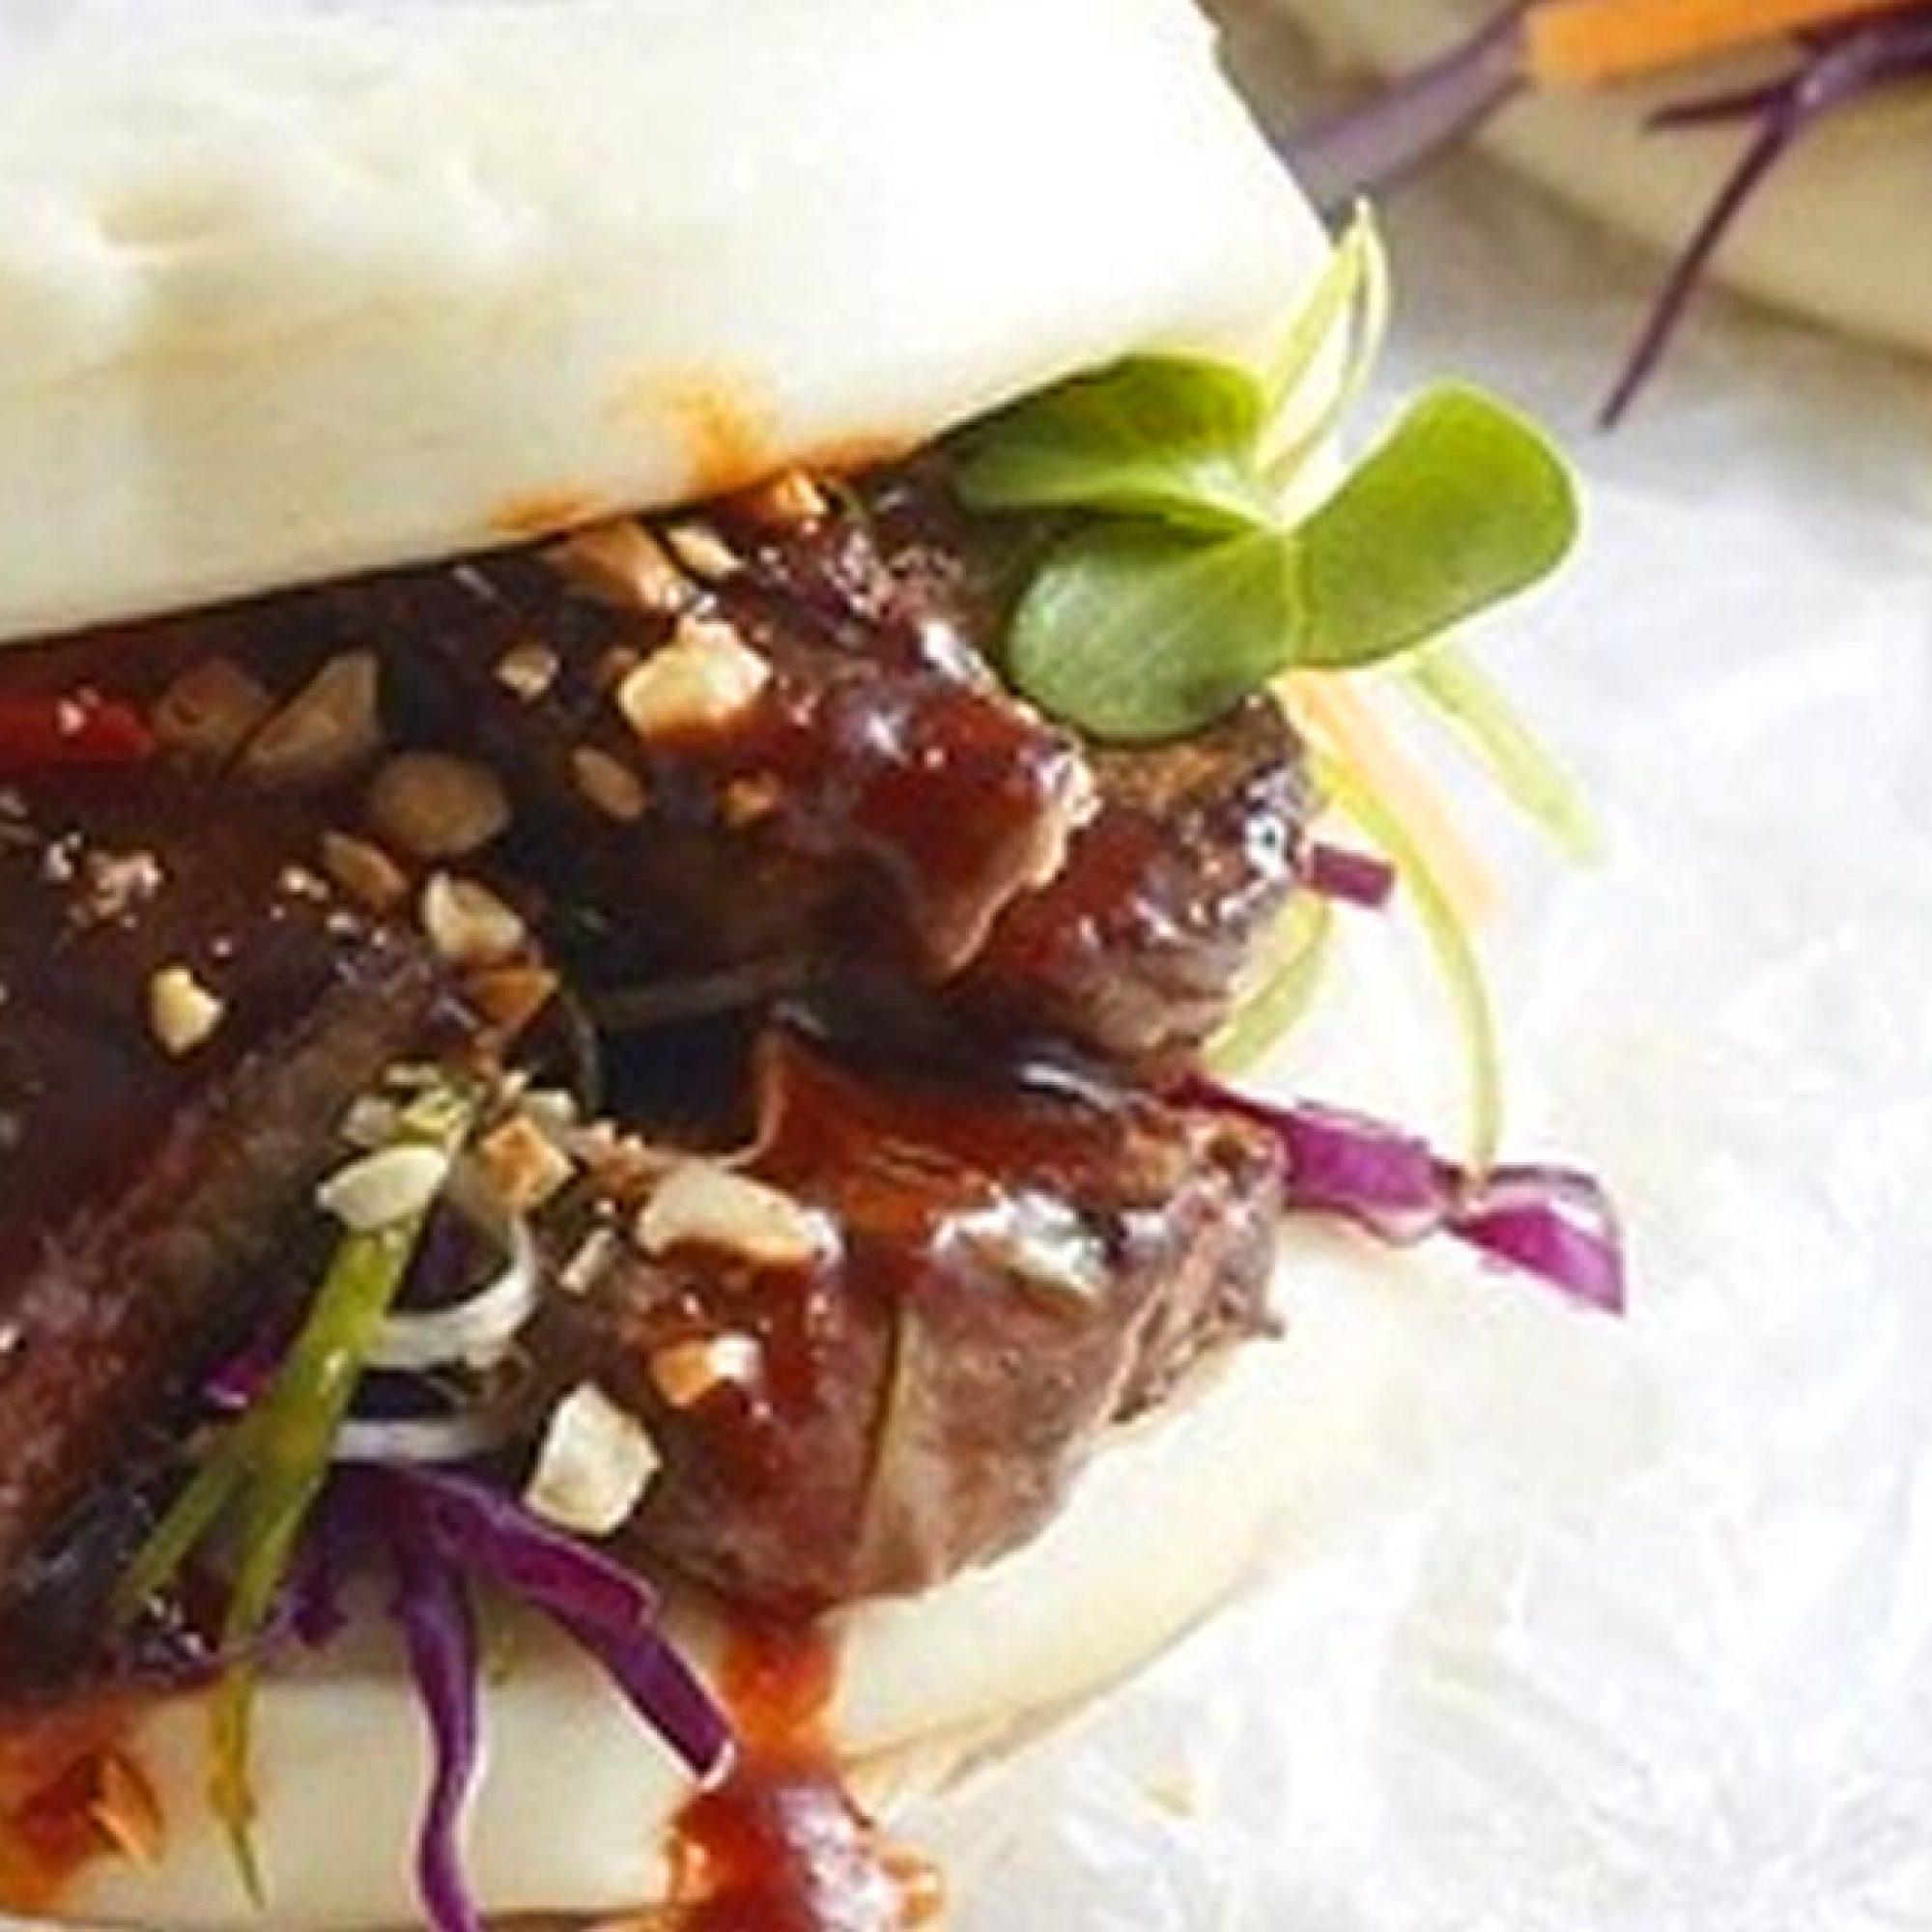 Beef Stir-Fry in Bao Buns